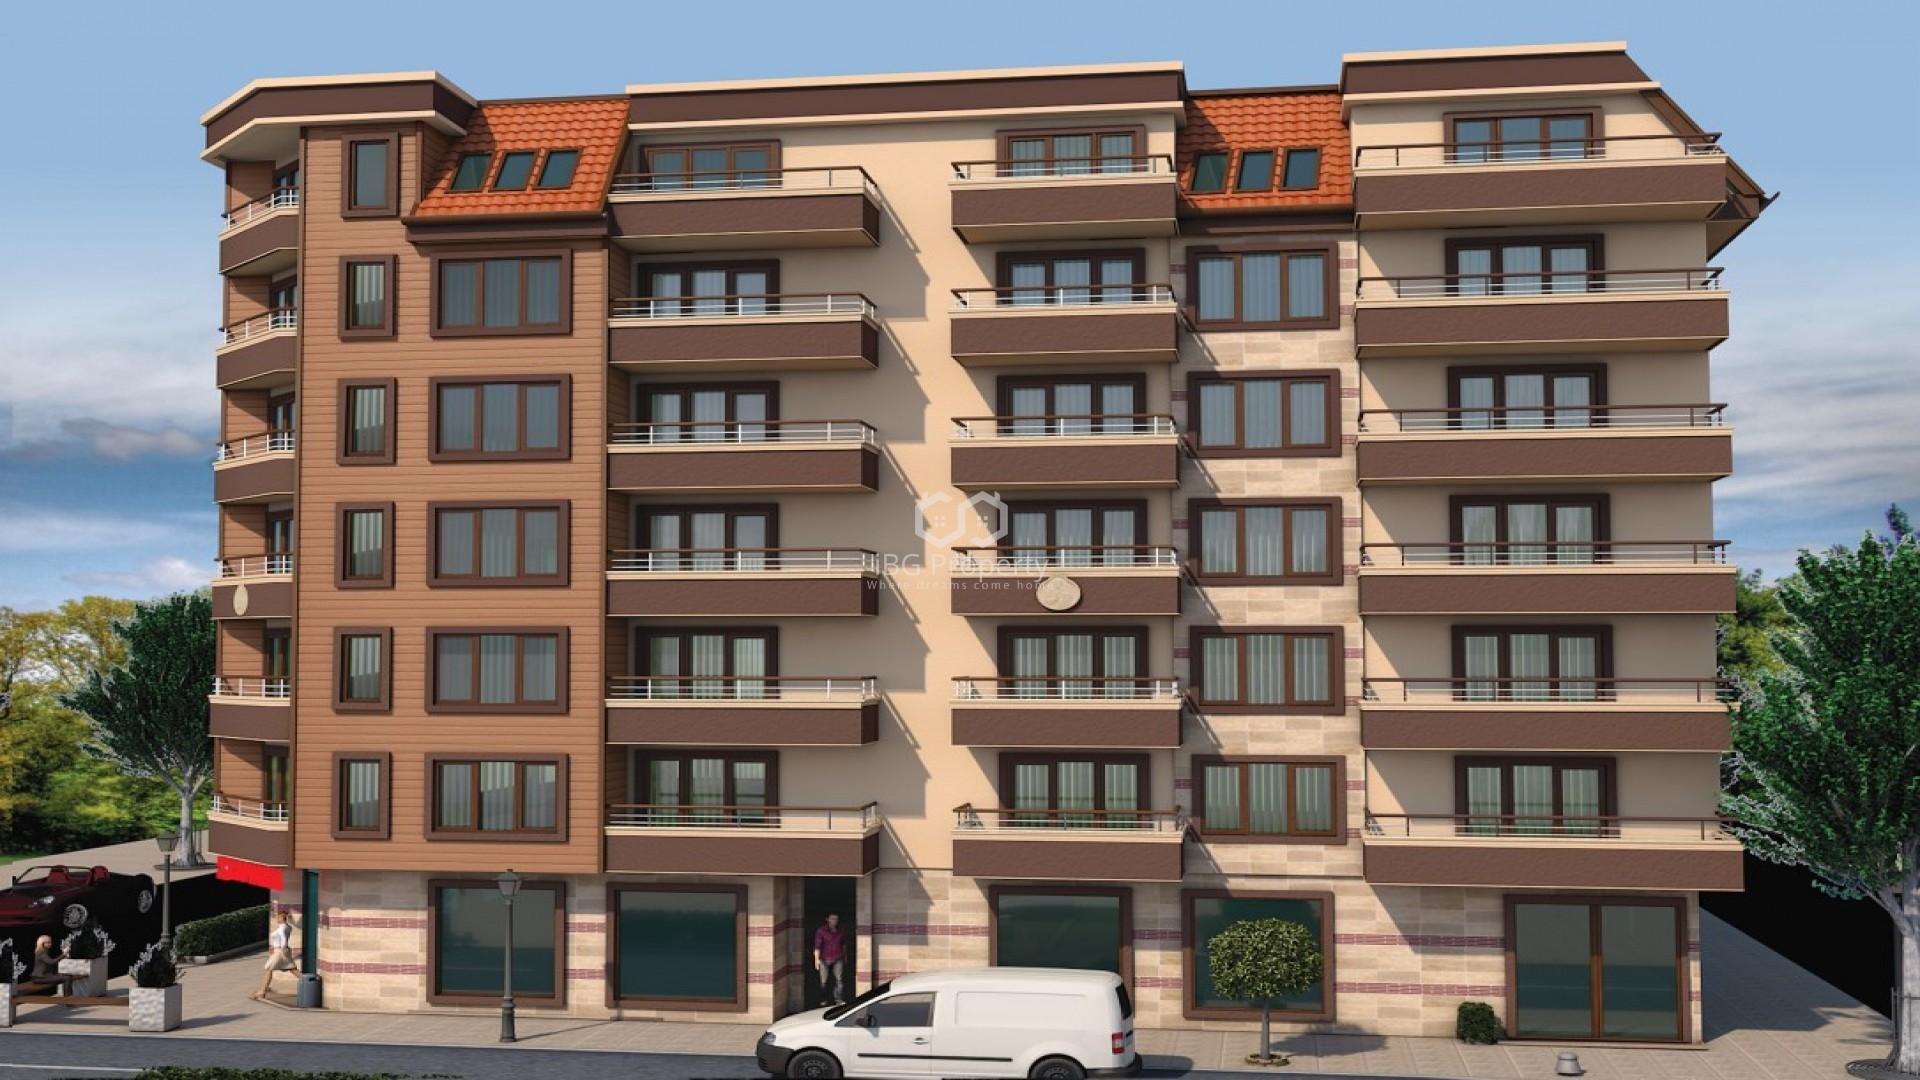 Двухкомнатная квартира Братя Миладинови Бургас 65 m2